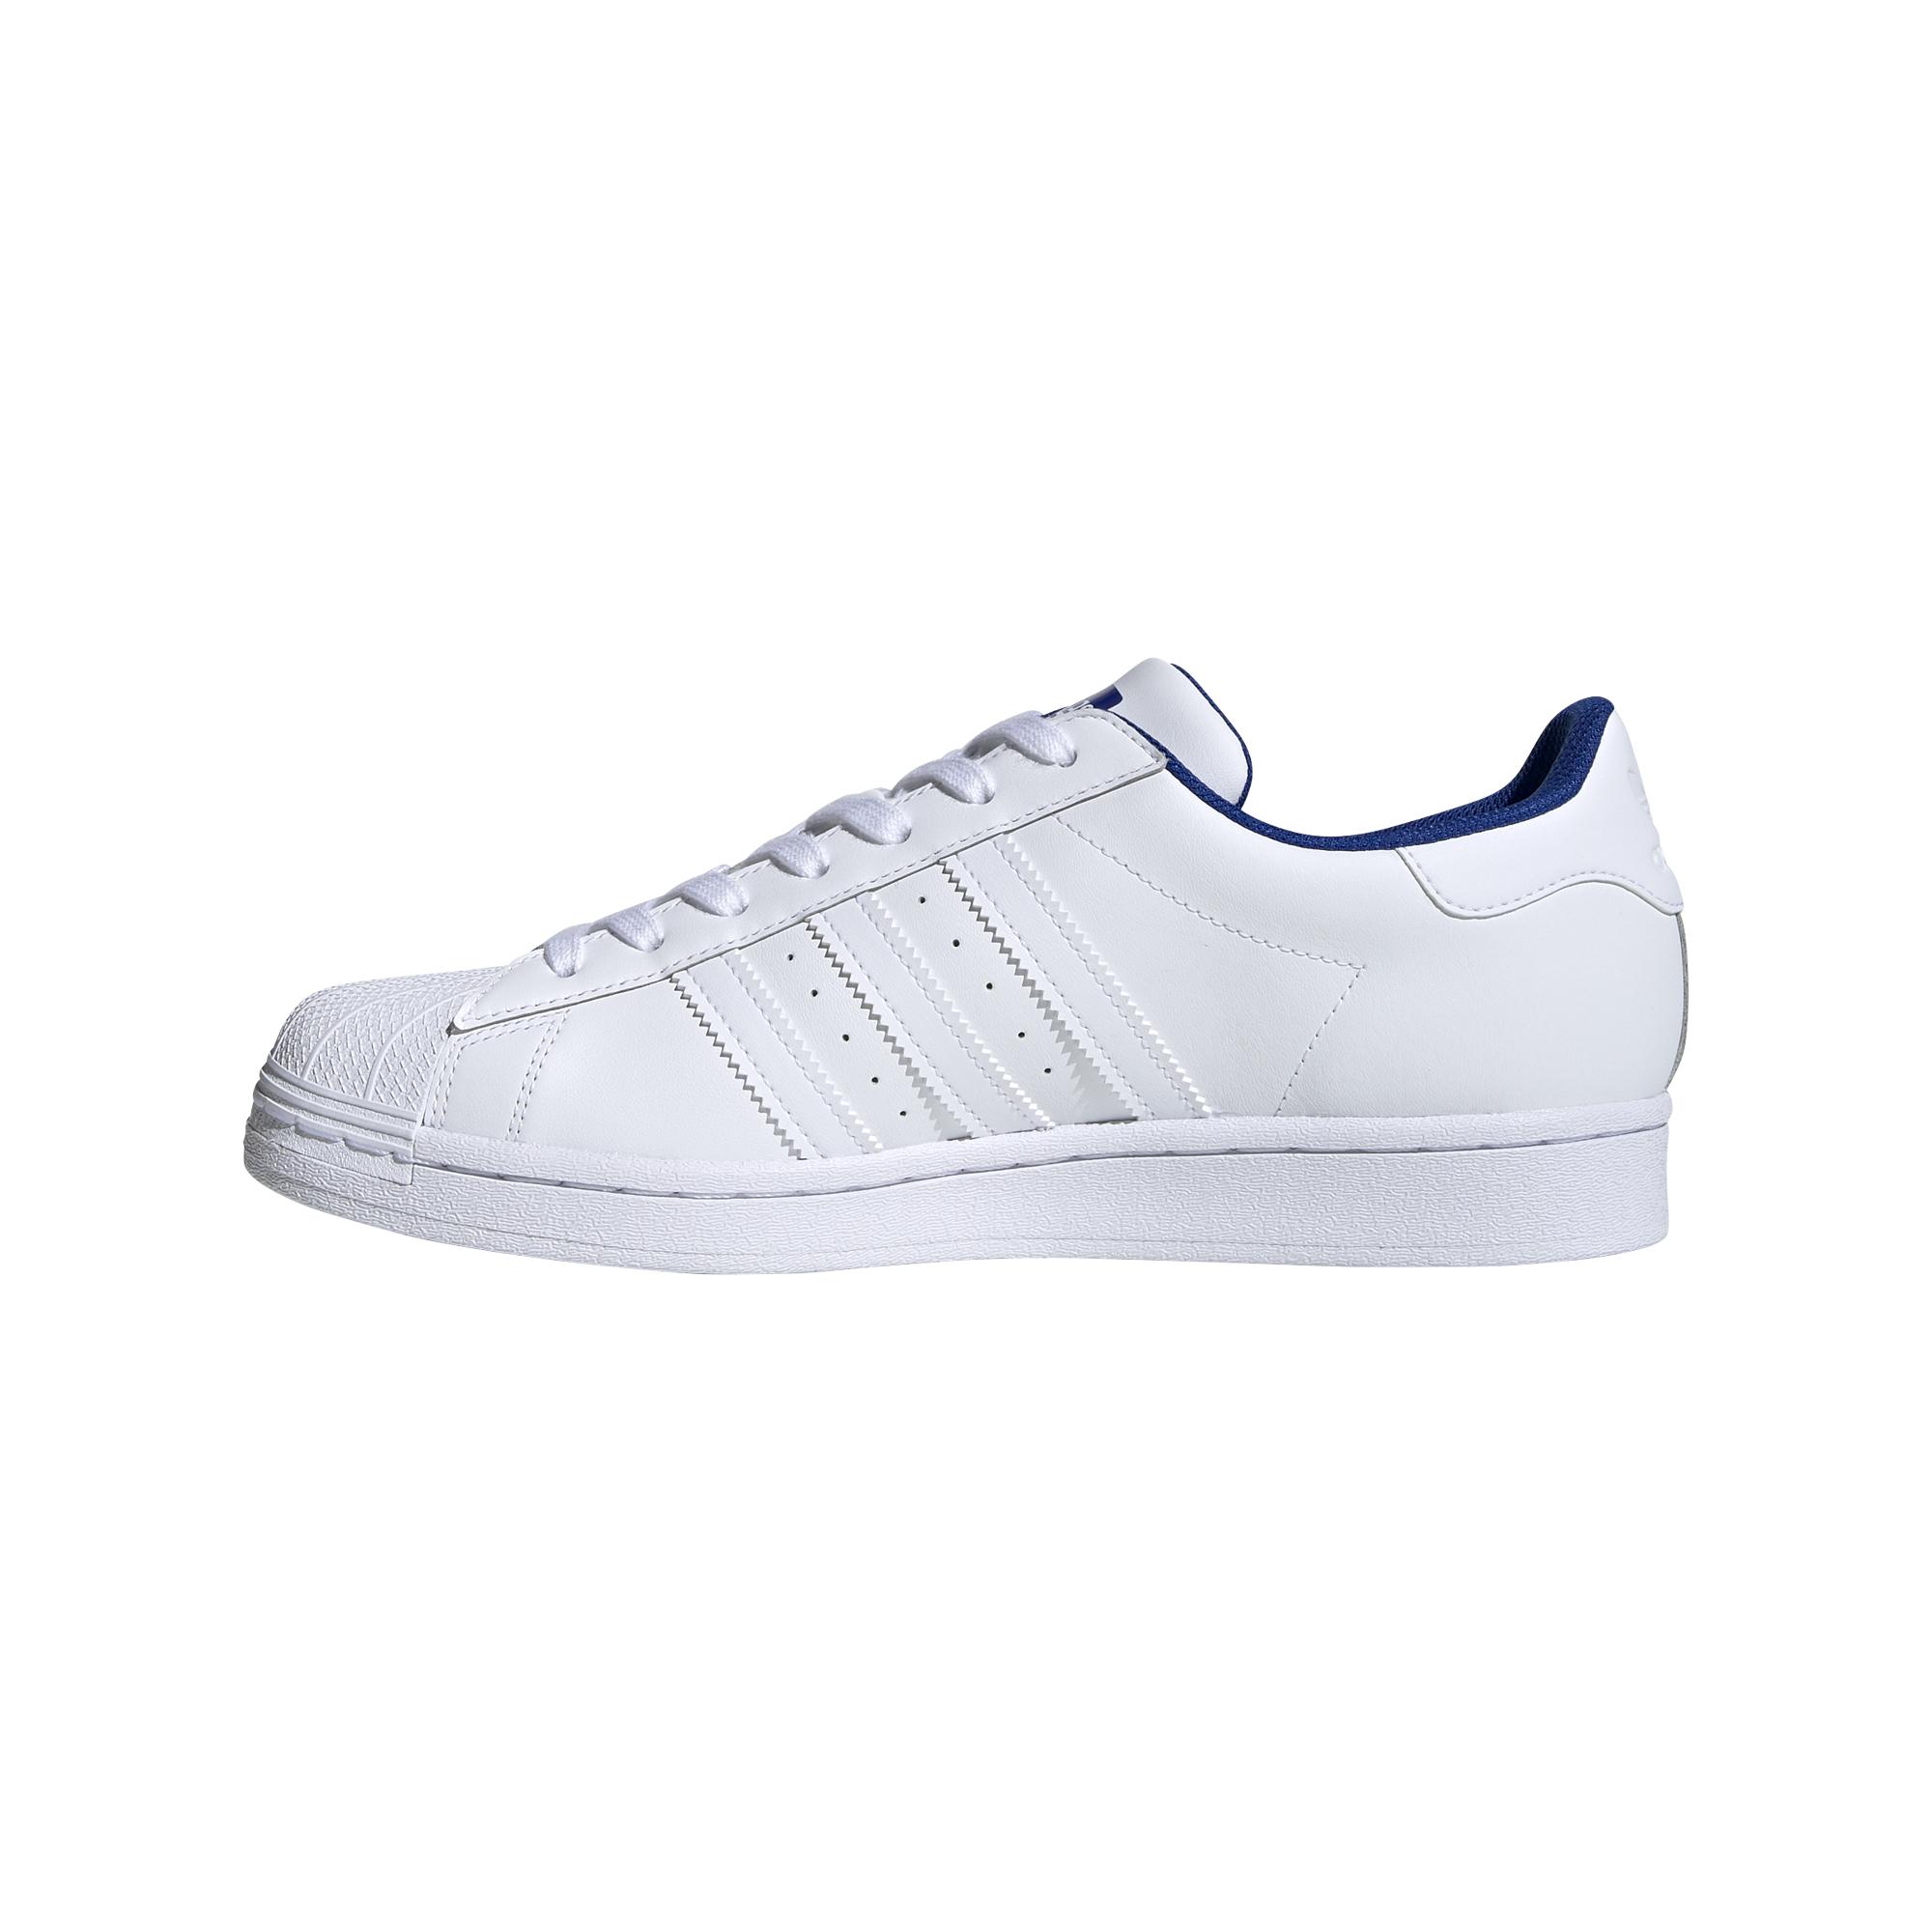 adidas Superstar Ftw White/ Ftw White/ Royal Blue FY2826